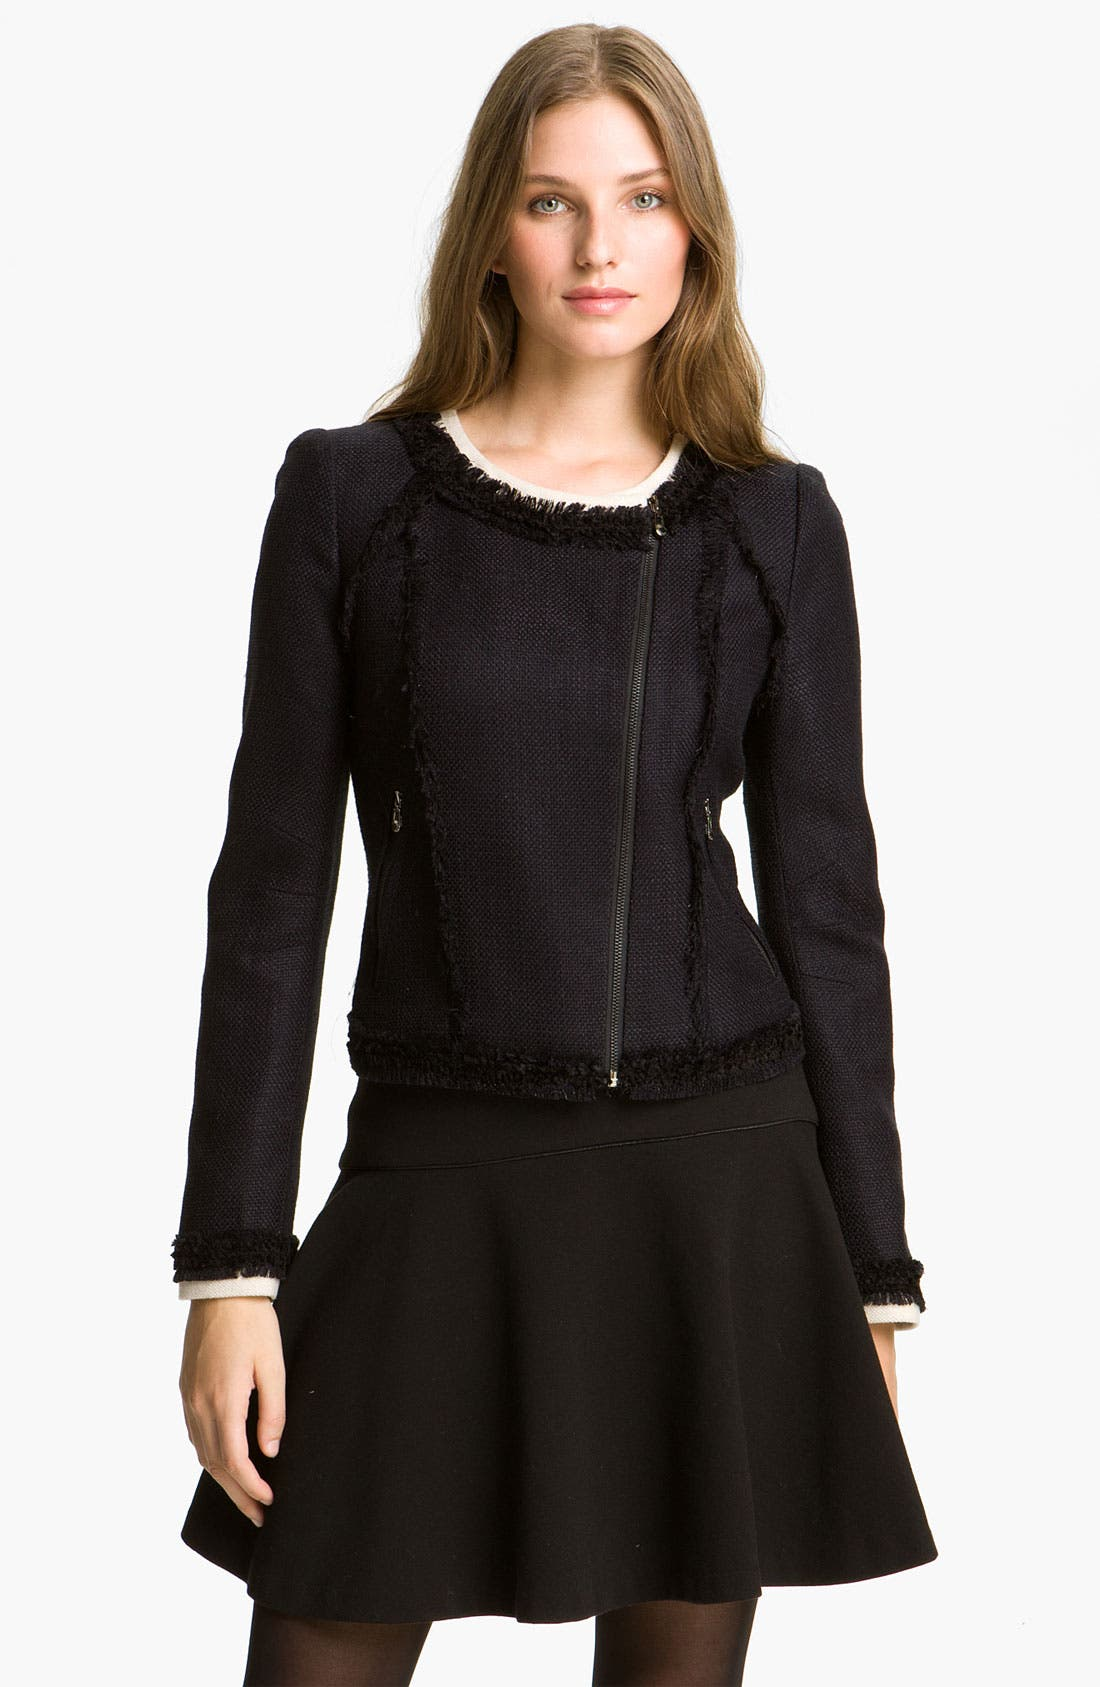 Main Image - Mcginn 'Sasha' Contrast Trim Tweed Jacket